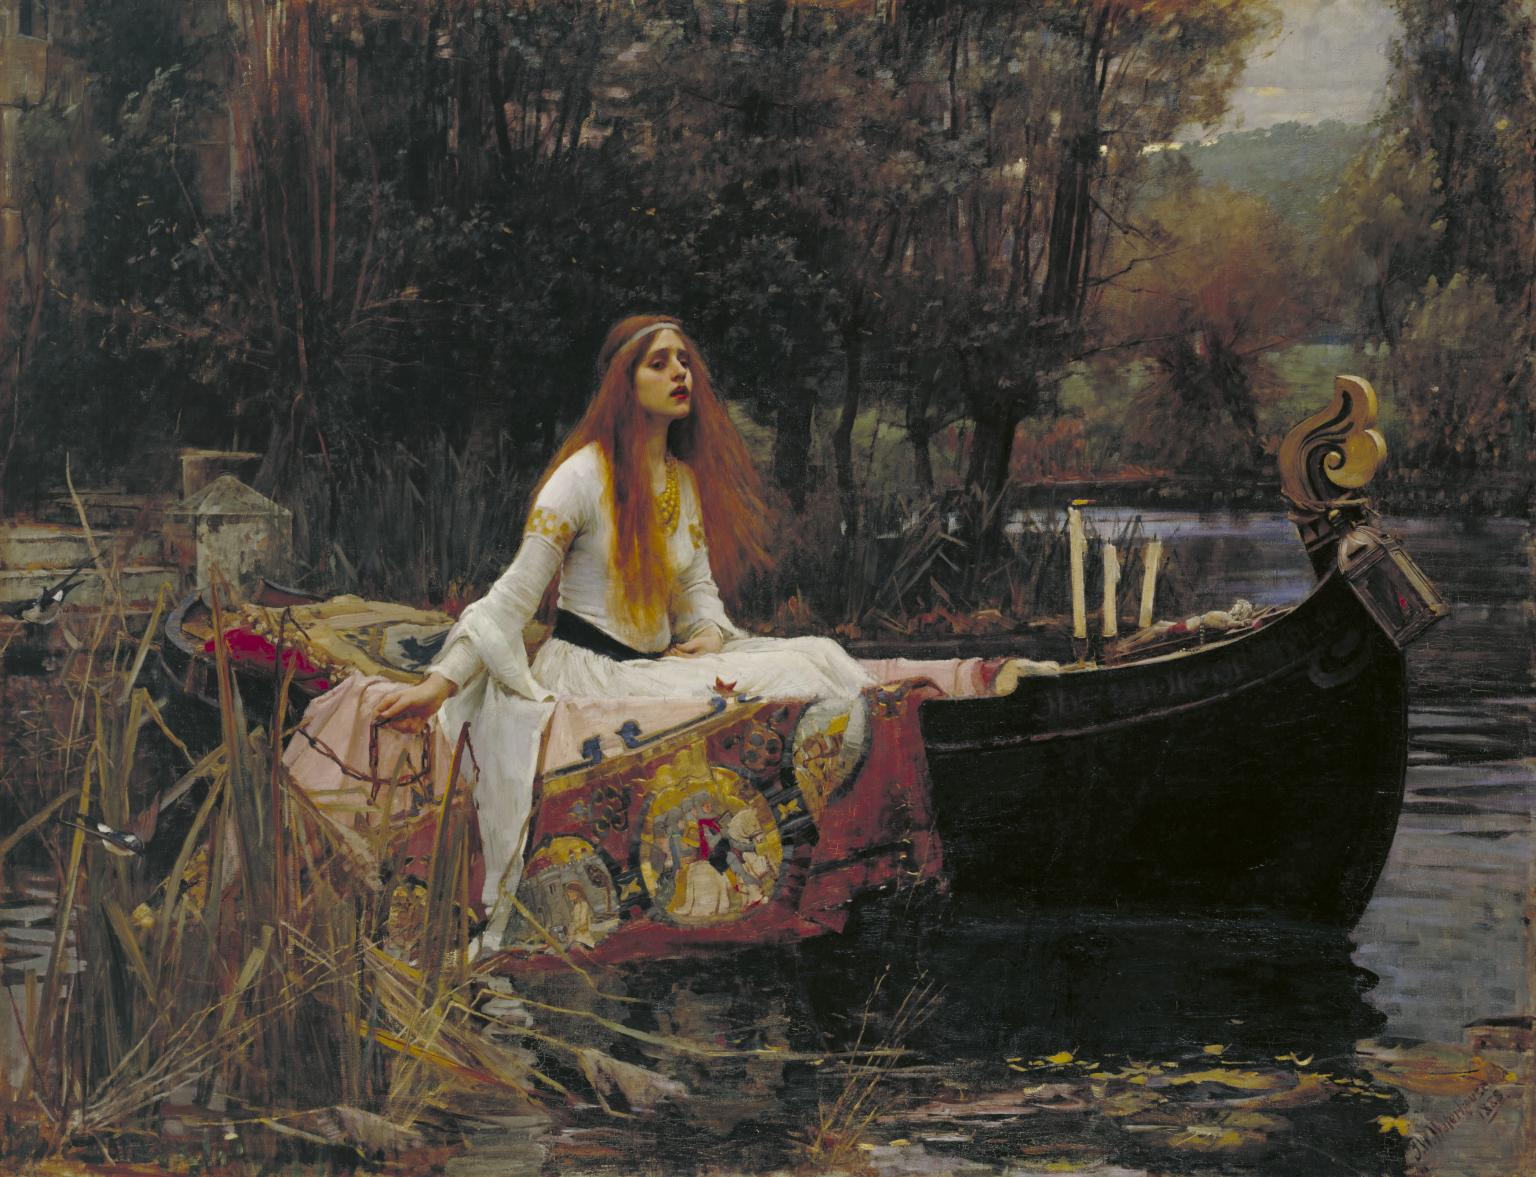 John William Waterhouse, 'The Lady of Shalott' 1888